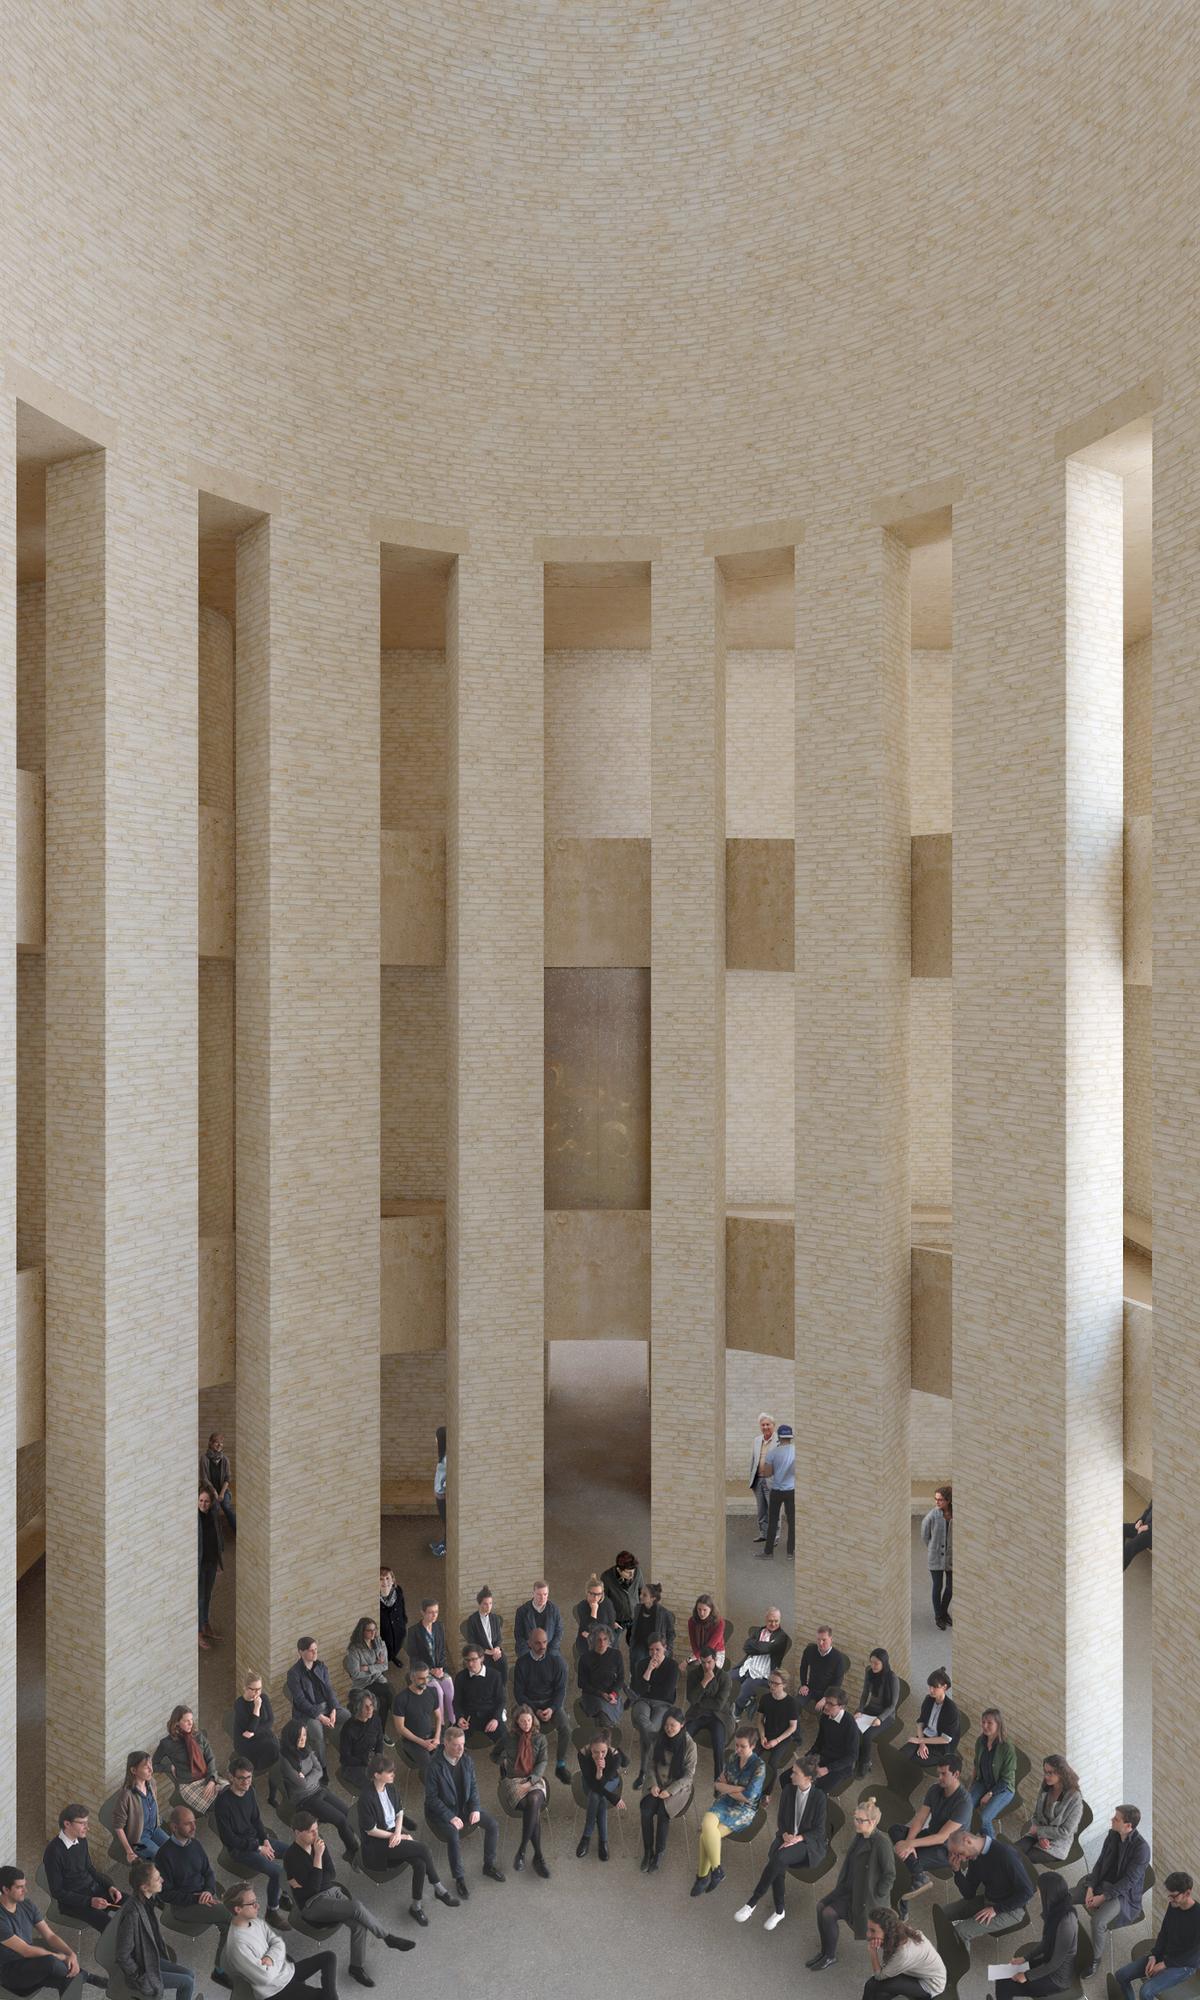 Domed Central Hall © Kuehn Malvezzi, Visualization: Kuehn Malvezzi